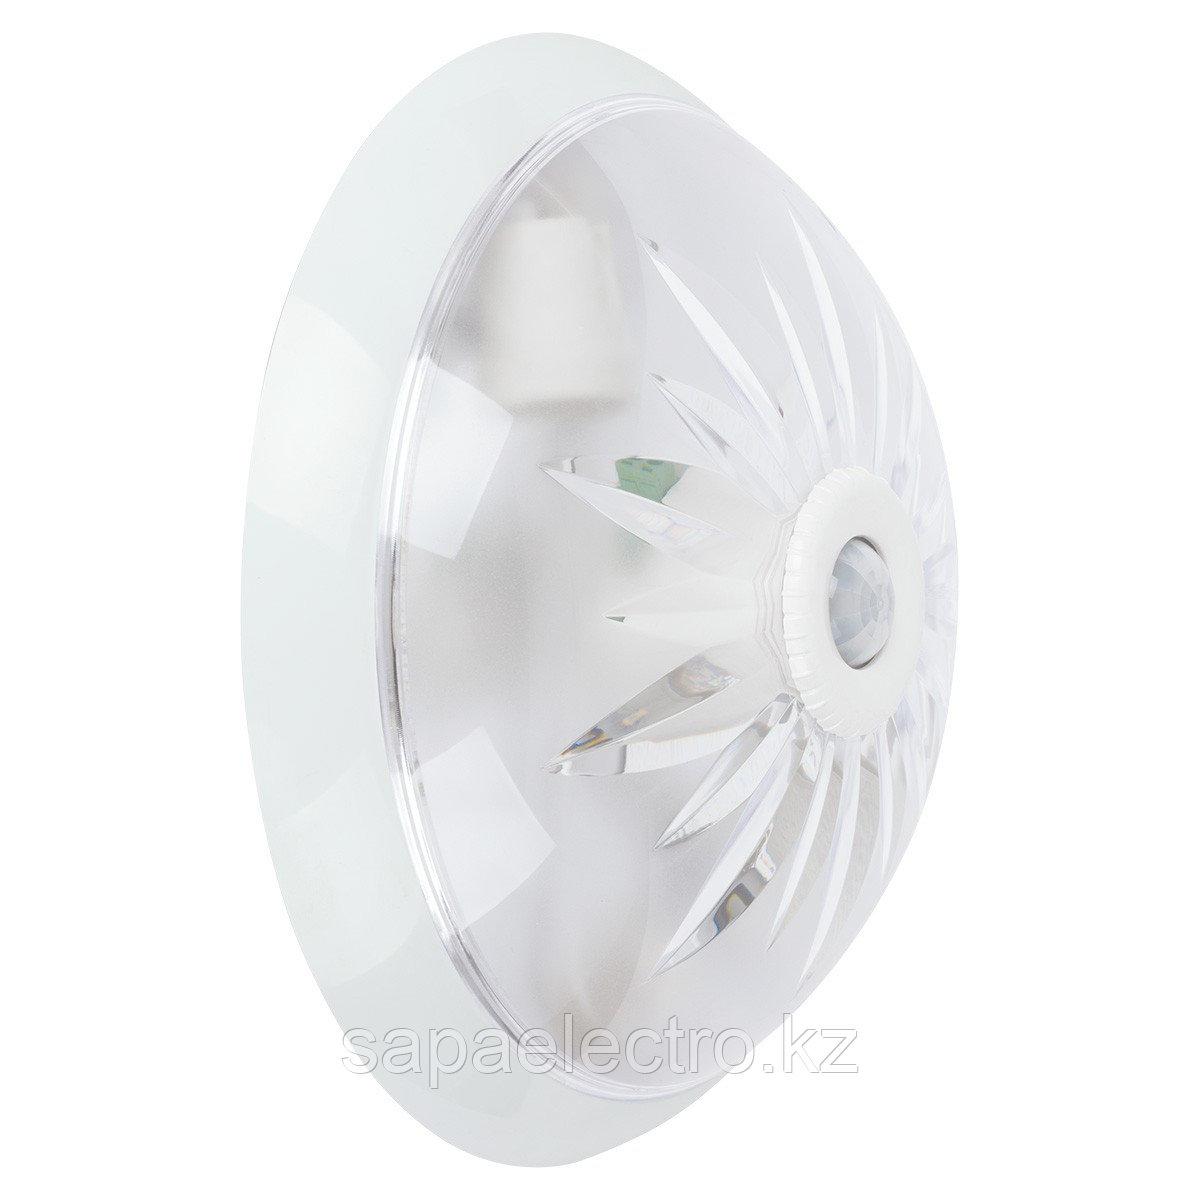 Св-к SMART SENSOR LED 18W 4000K 265мм  MGL (12шт)